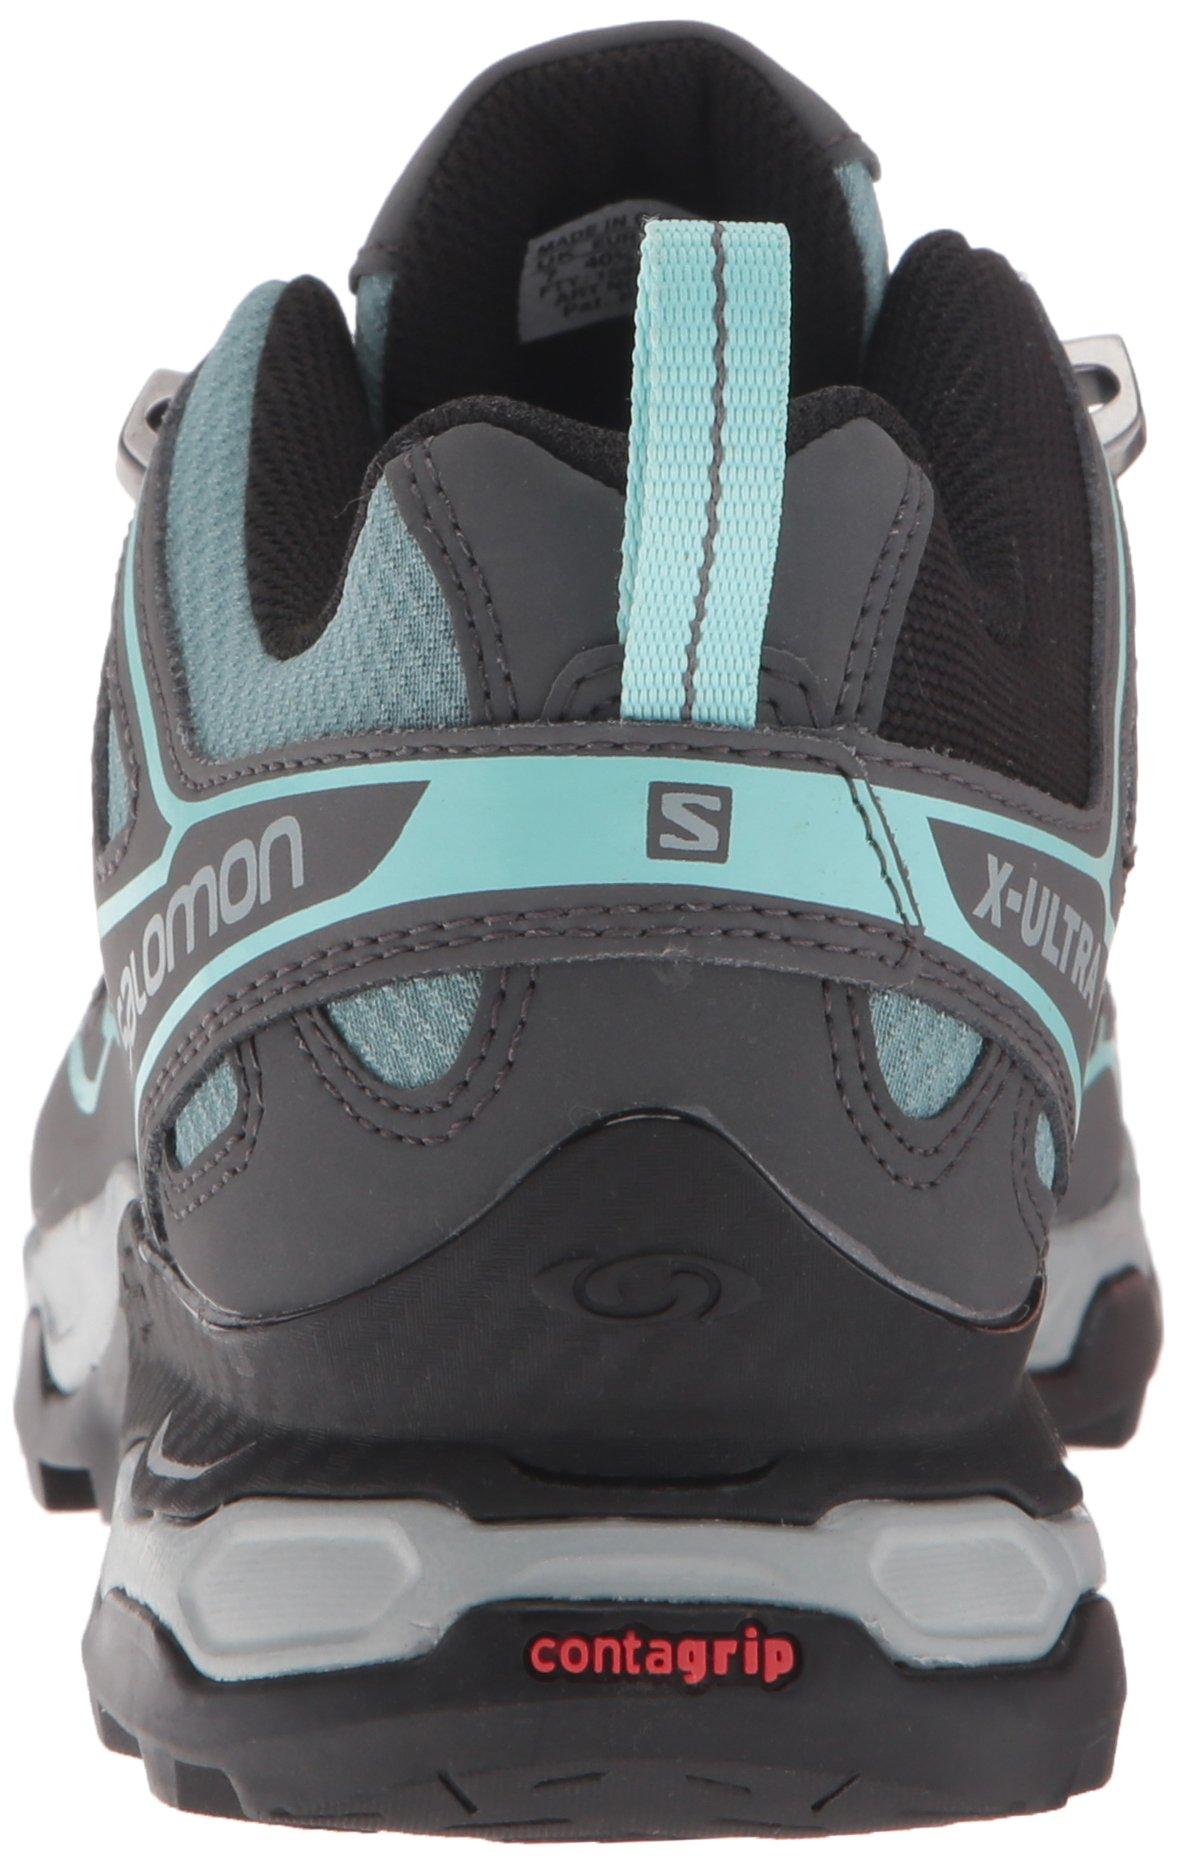 71afHDfZ5iL - SALOMON Women's Hiking Shoe